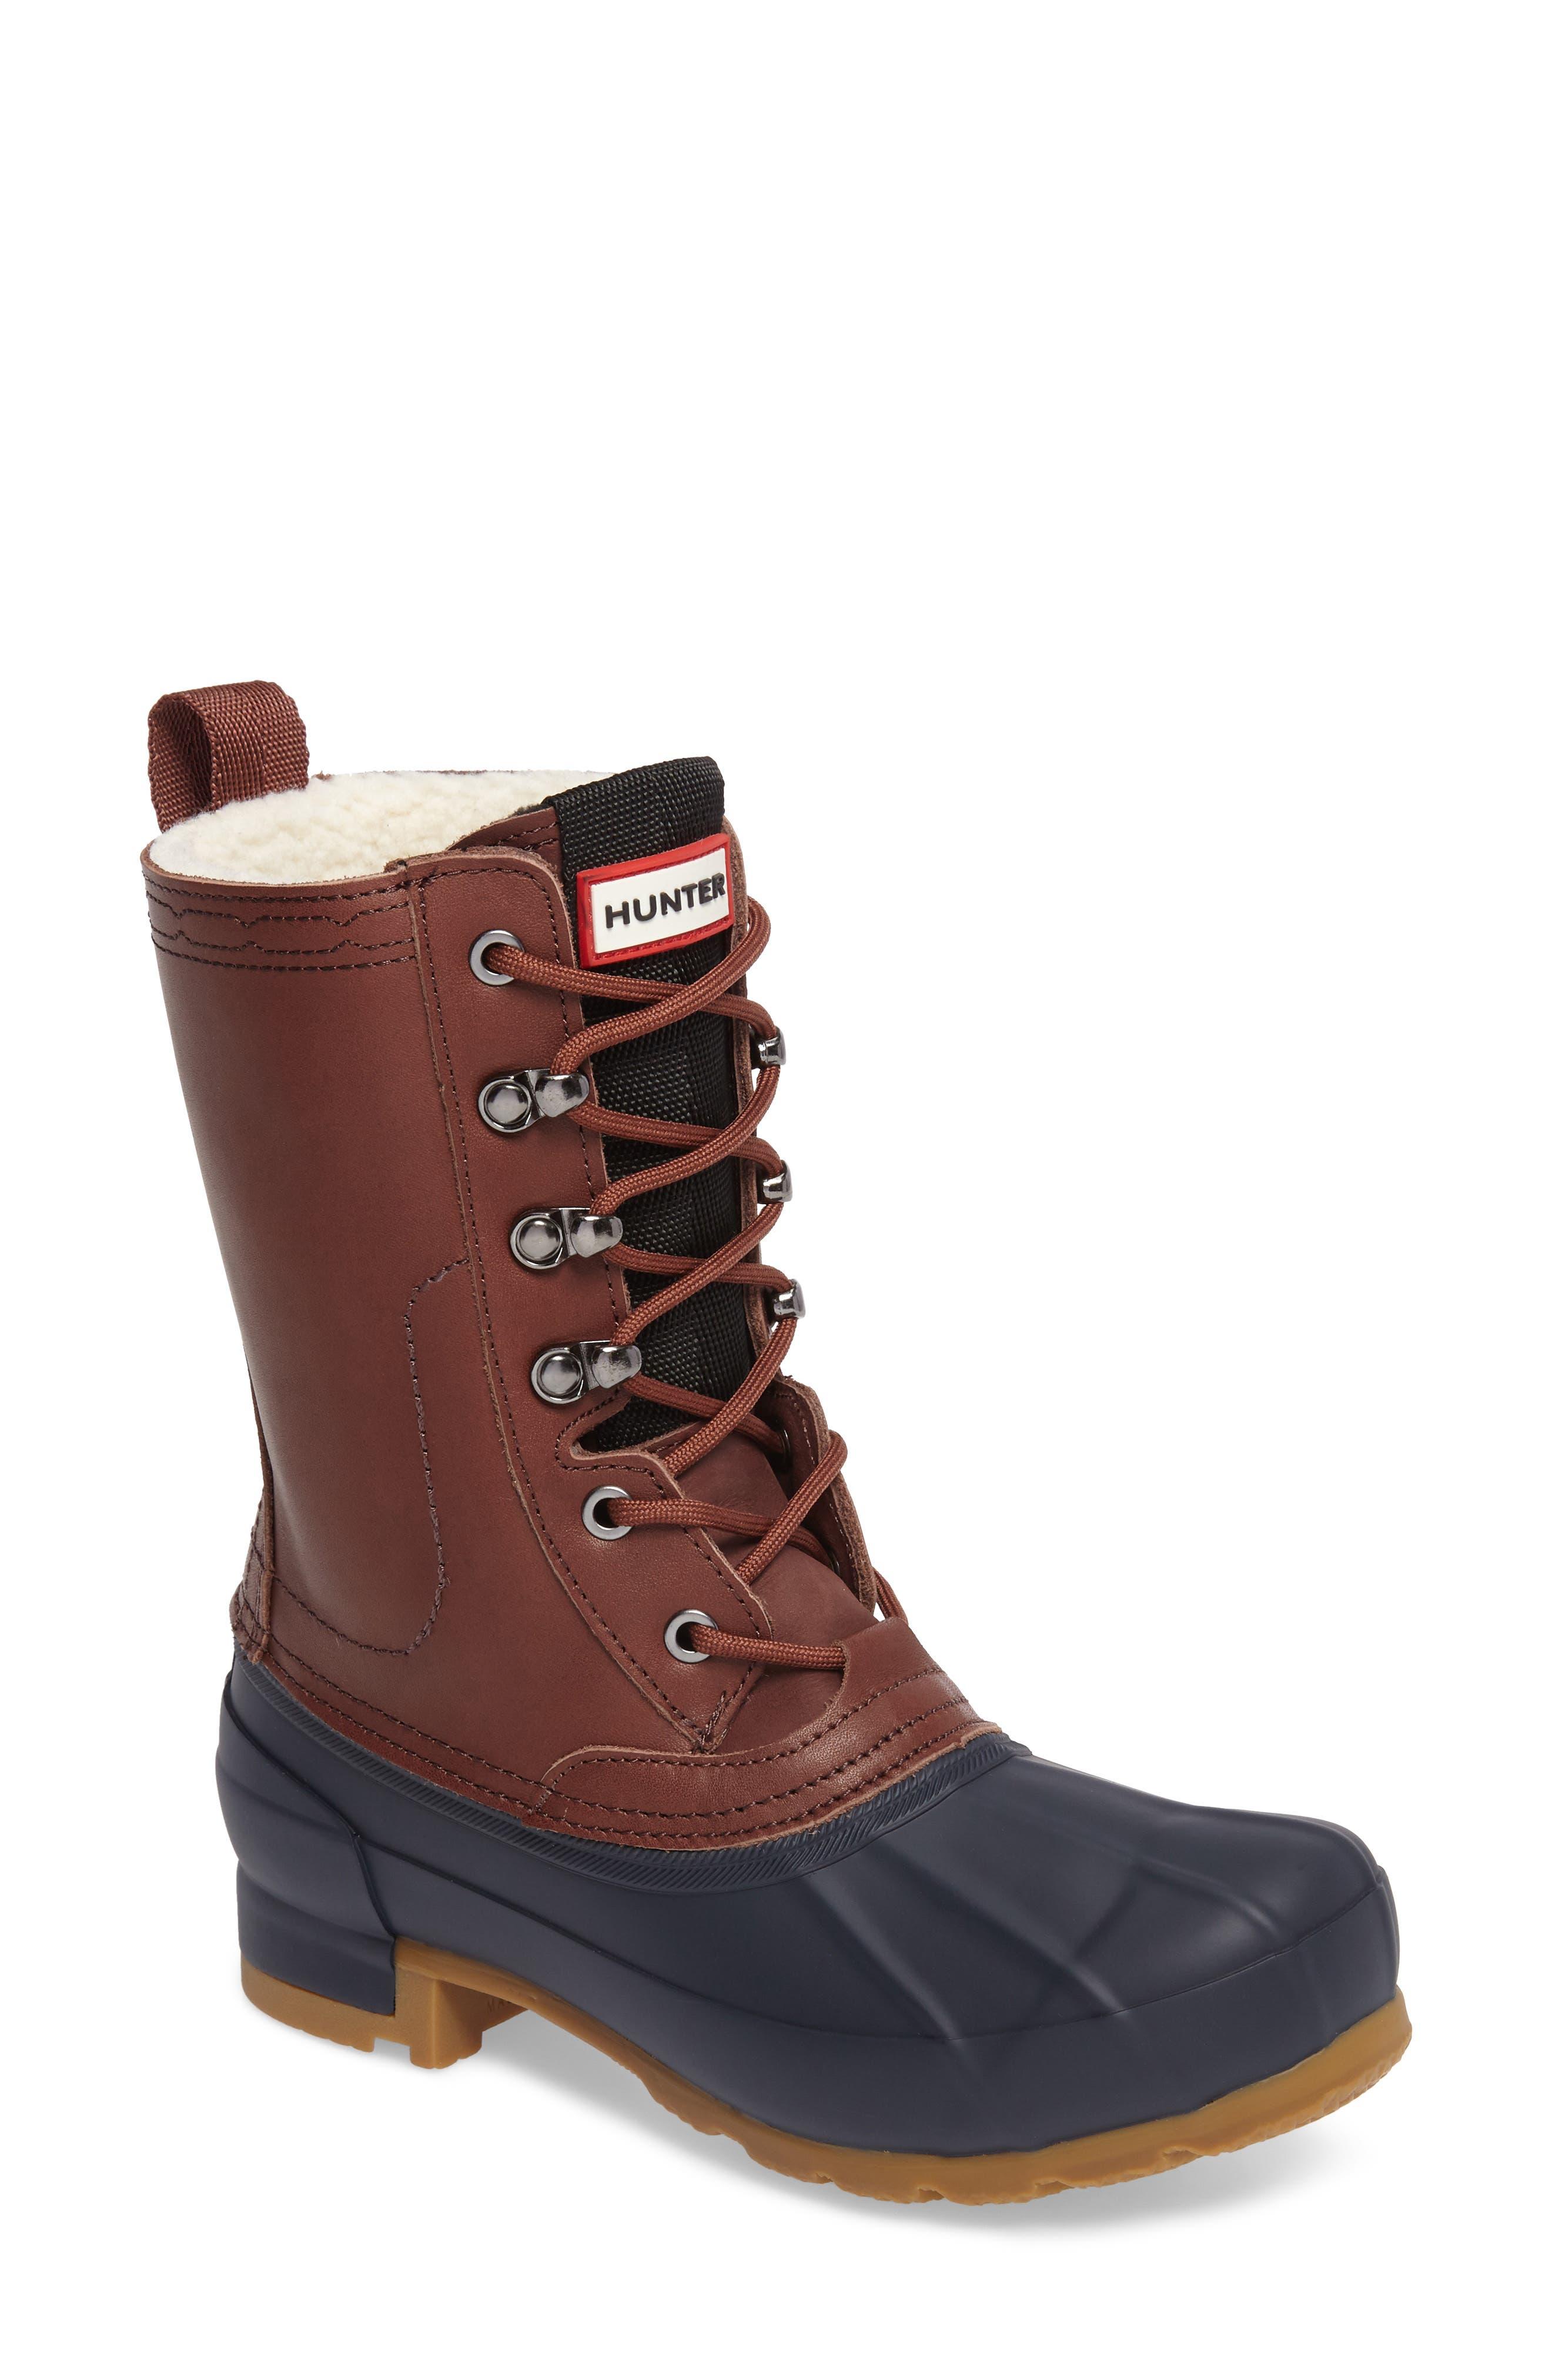 Alternate Image 1 Selected - Hunter Original Insulated Boot (Women)